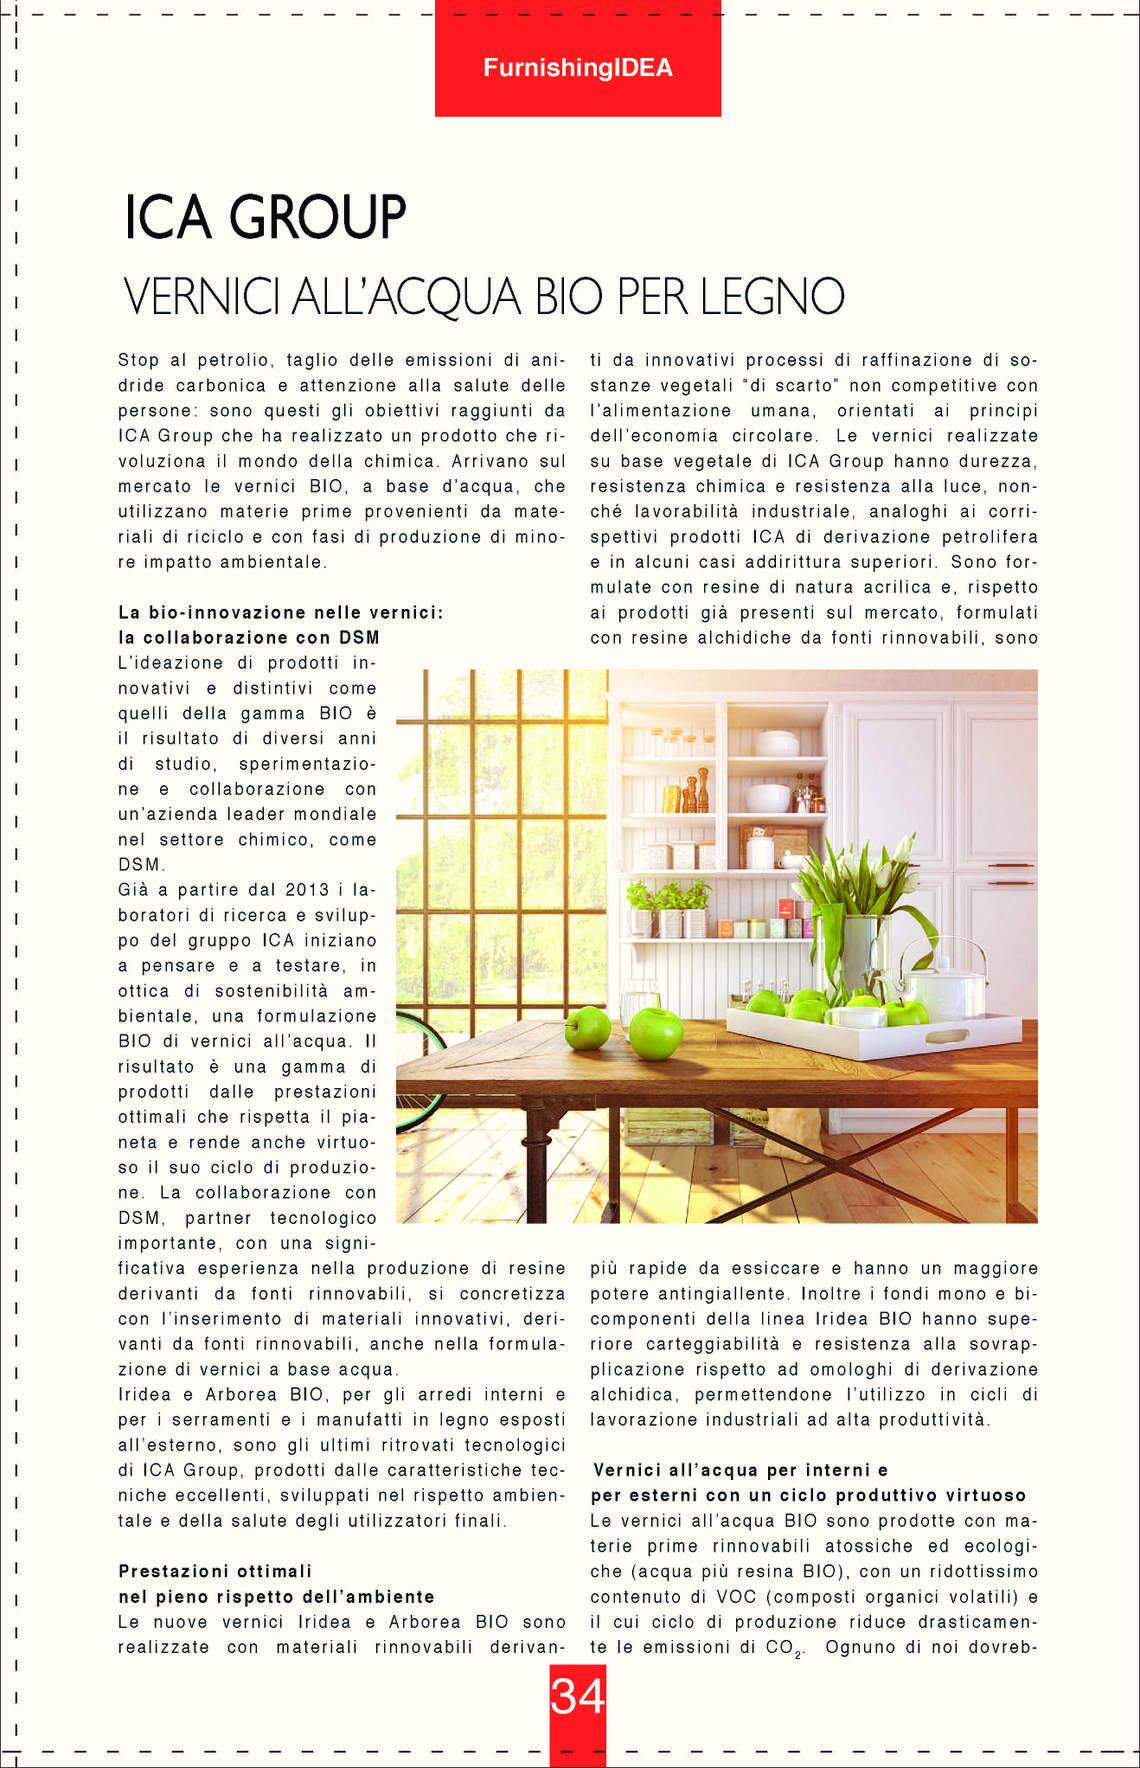 furnishing-idea-journal--1-2018_journal_9_033.jpg